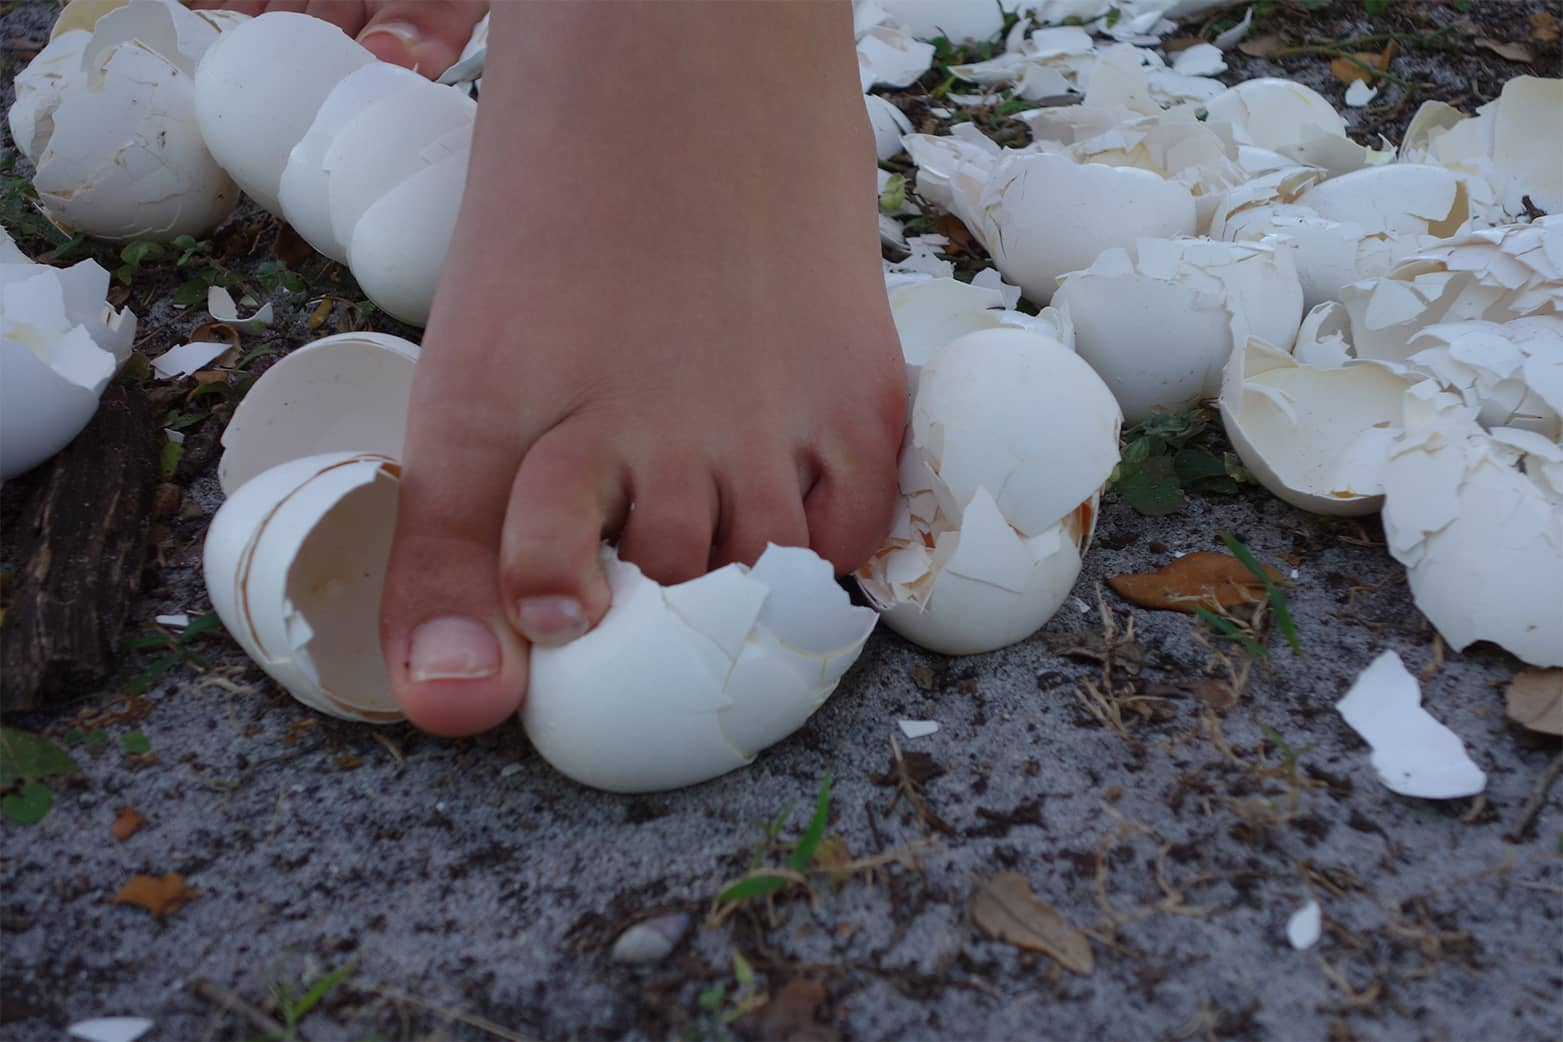 walking_on_eggshells2